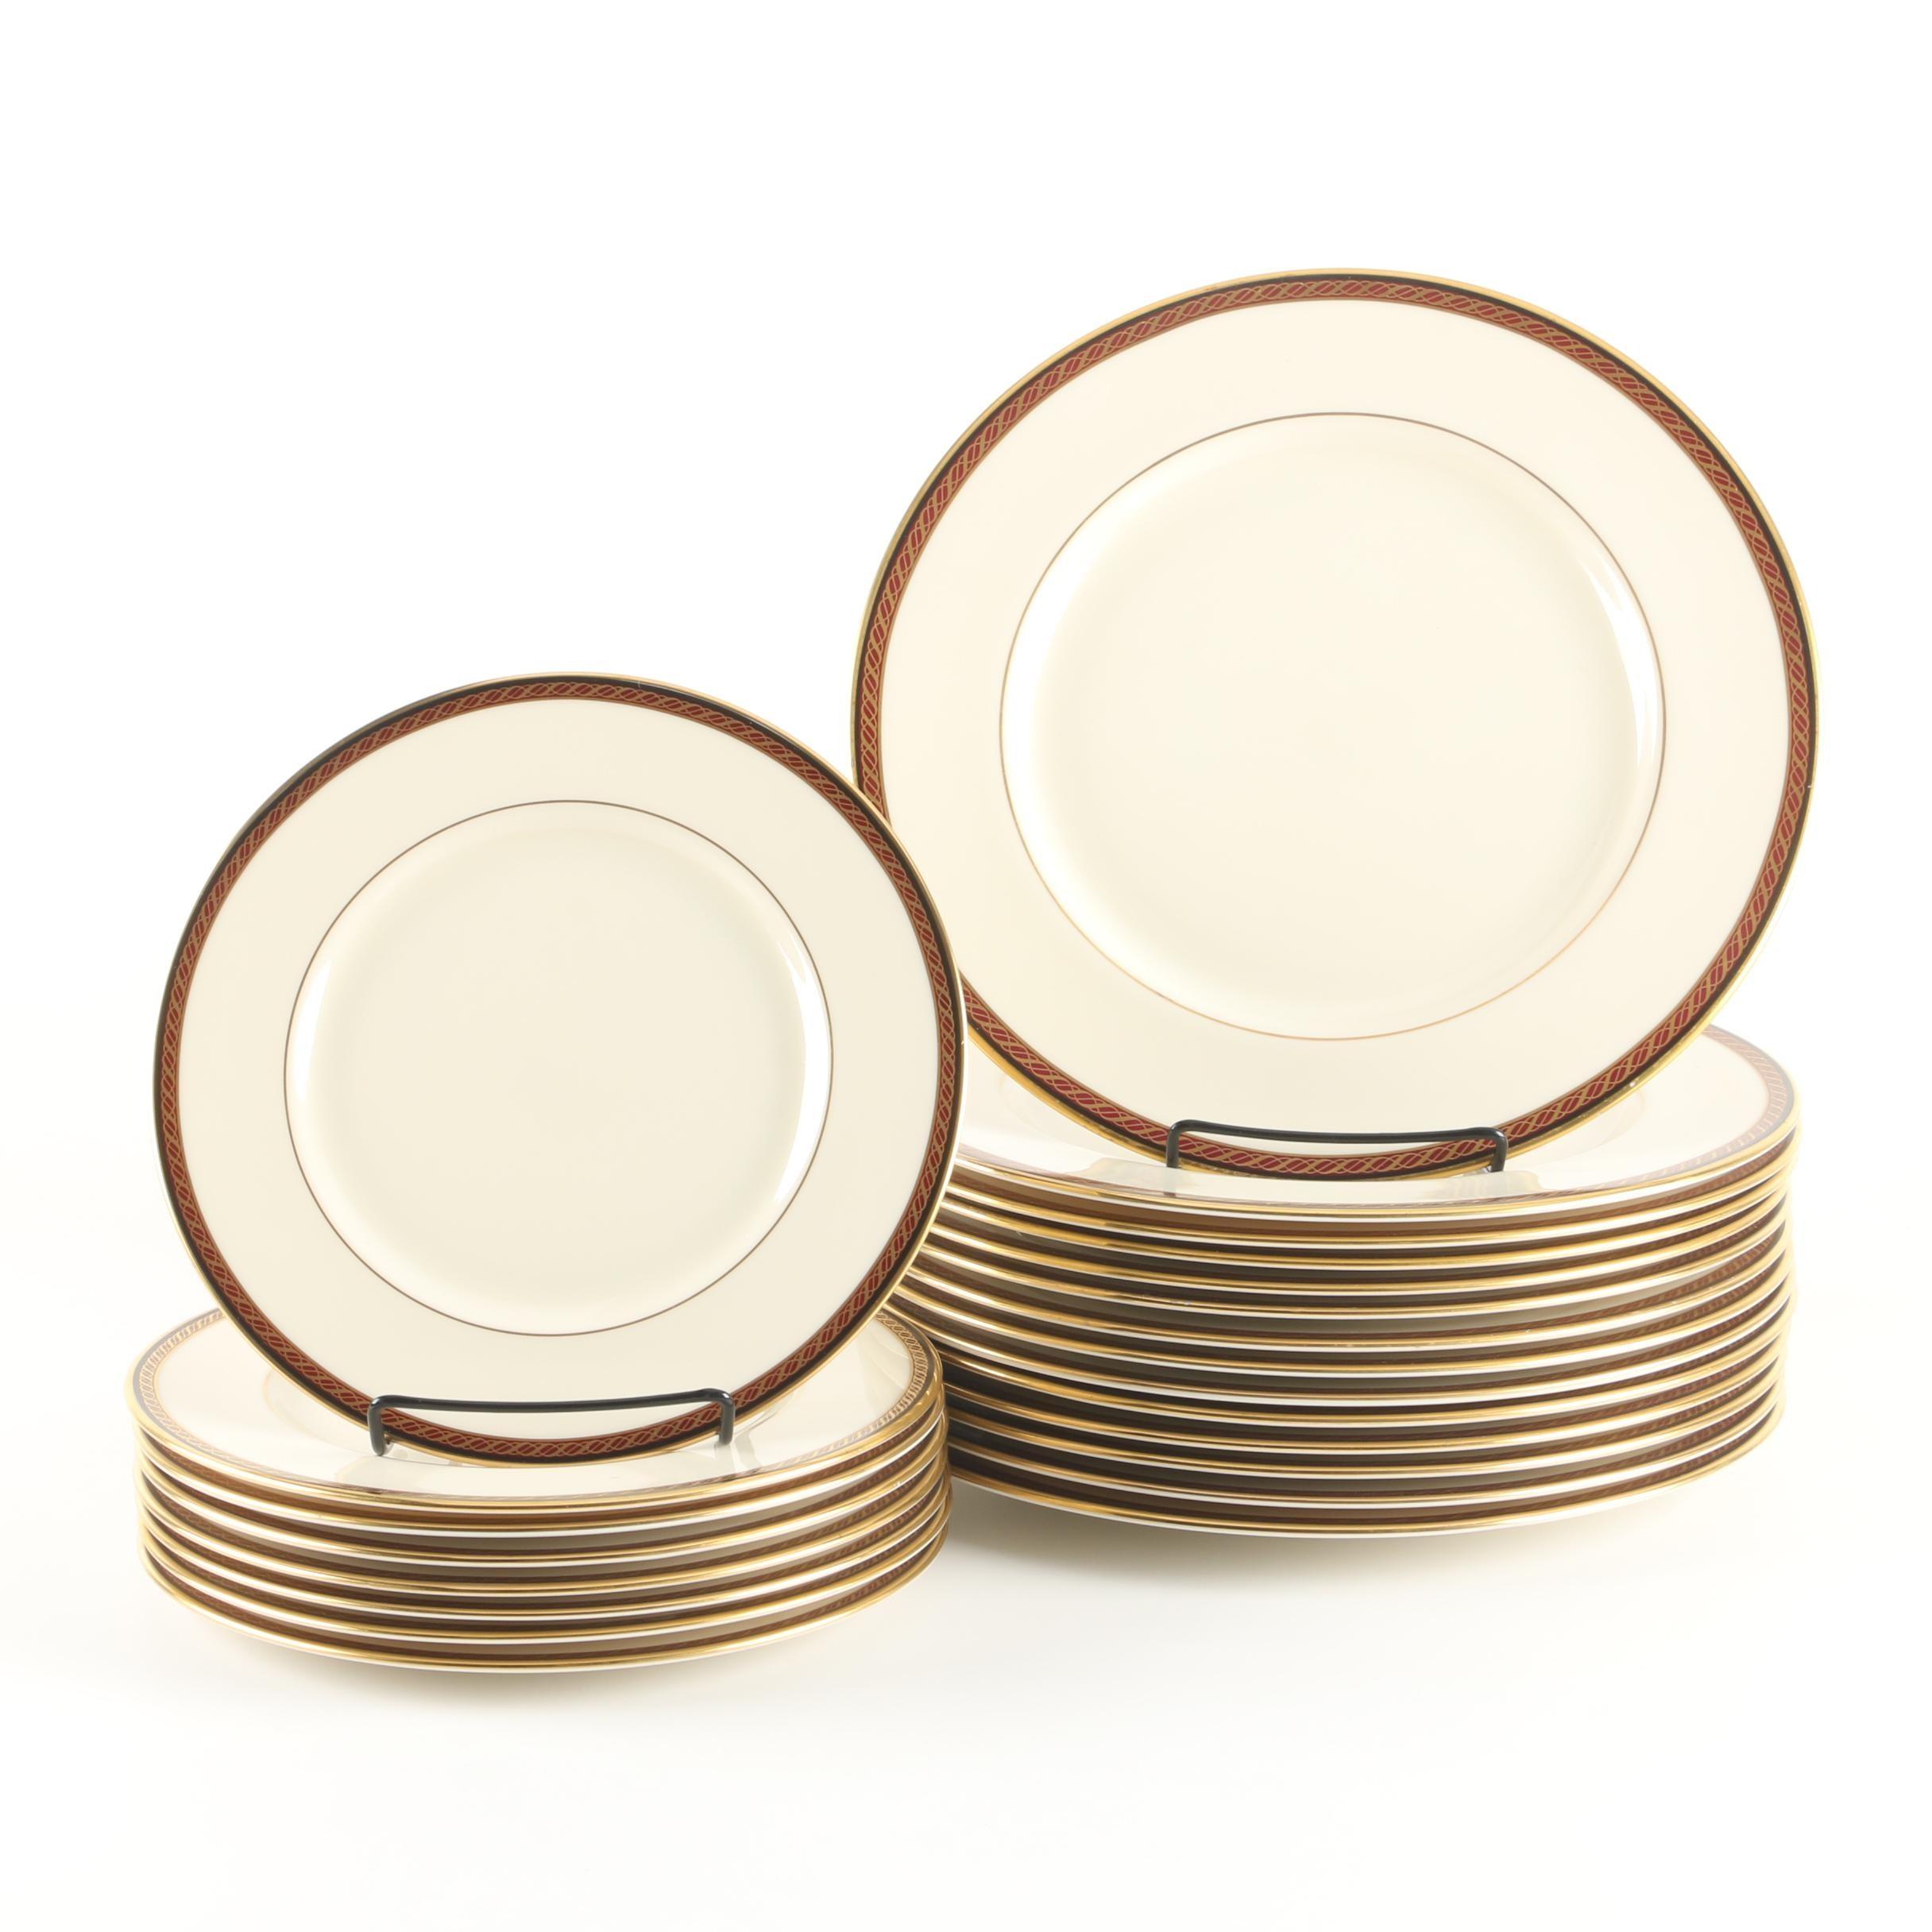 "Vintage Lenox ""Monroe"" Porcelain plates ca. 1983-89"